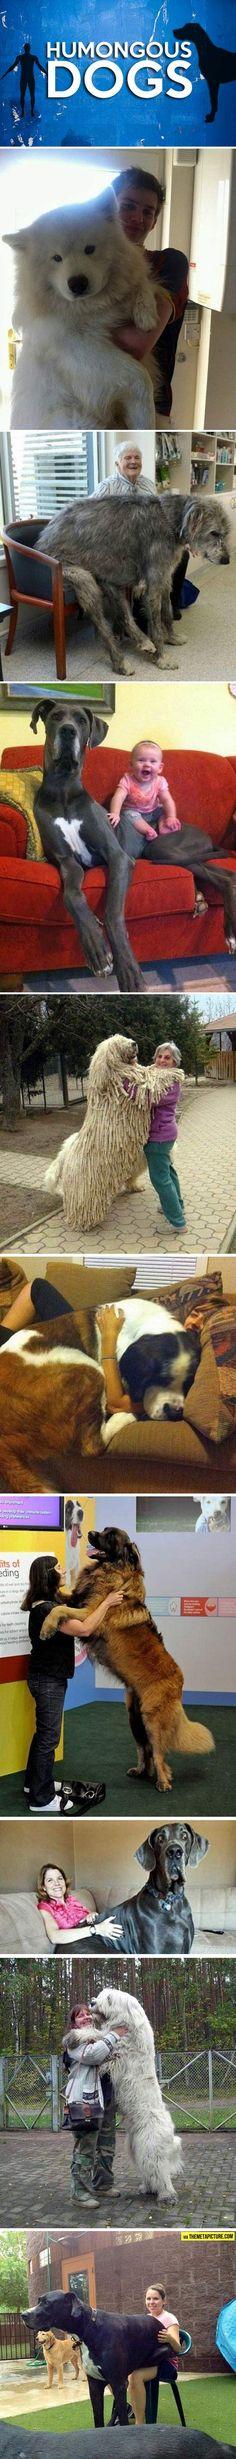 Humongous Dogs…love the sammy and the Komondor